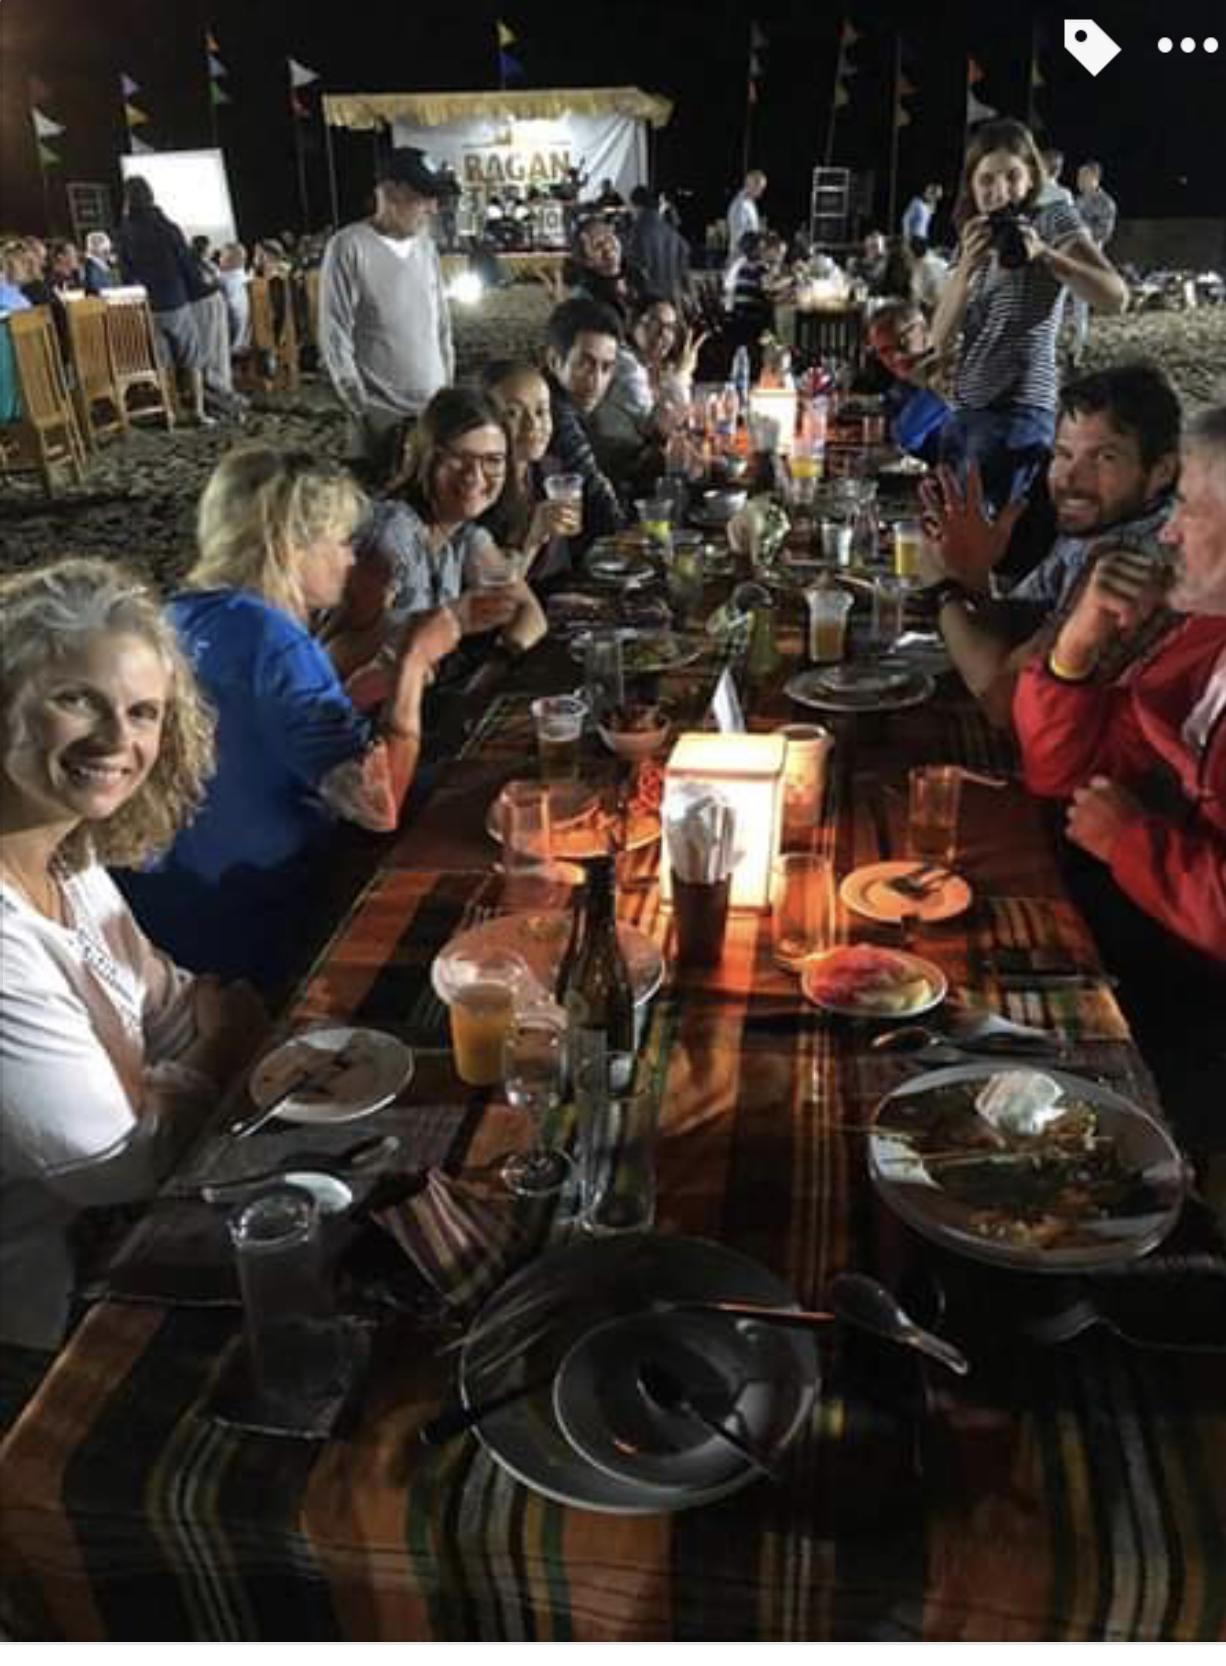 Celebration Dinner for the Bagan Temple Marathon runners